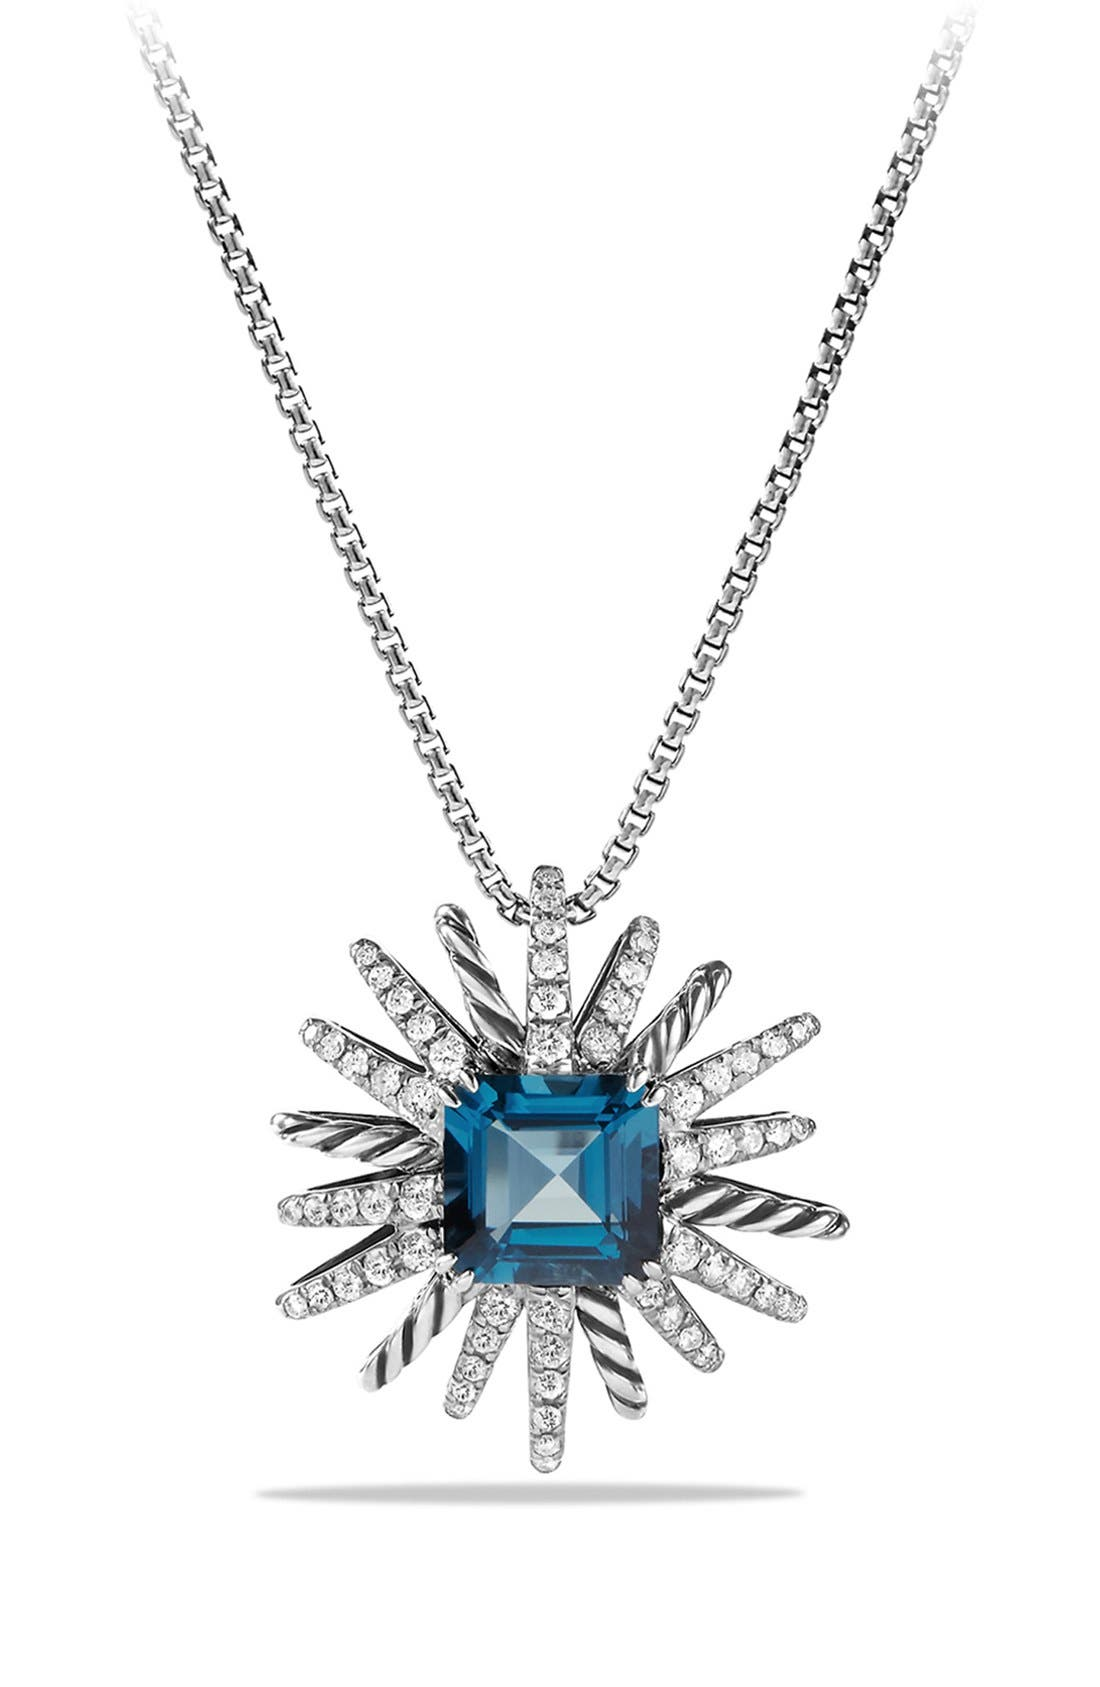 DAVID YURMAN 'Starburst' Pendant Necklace